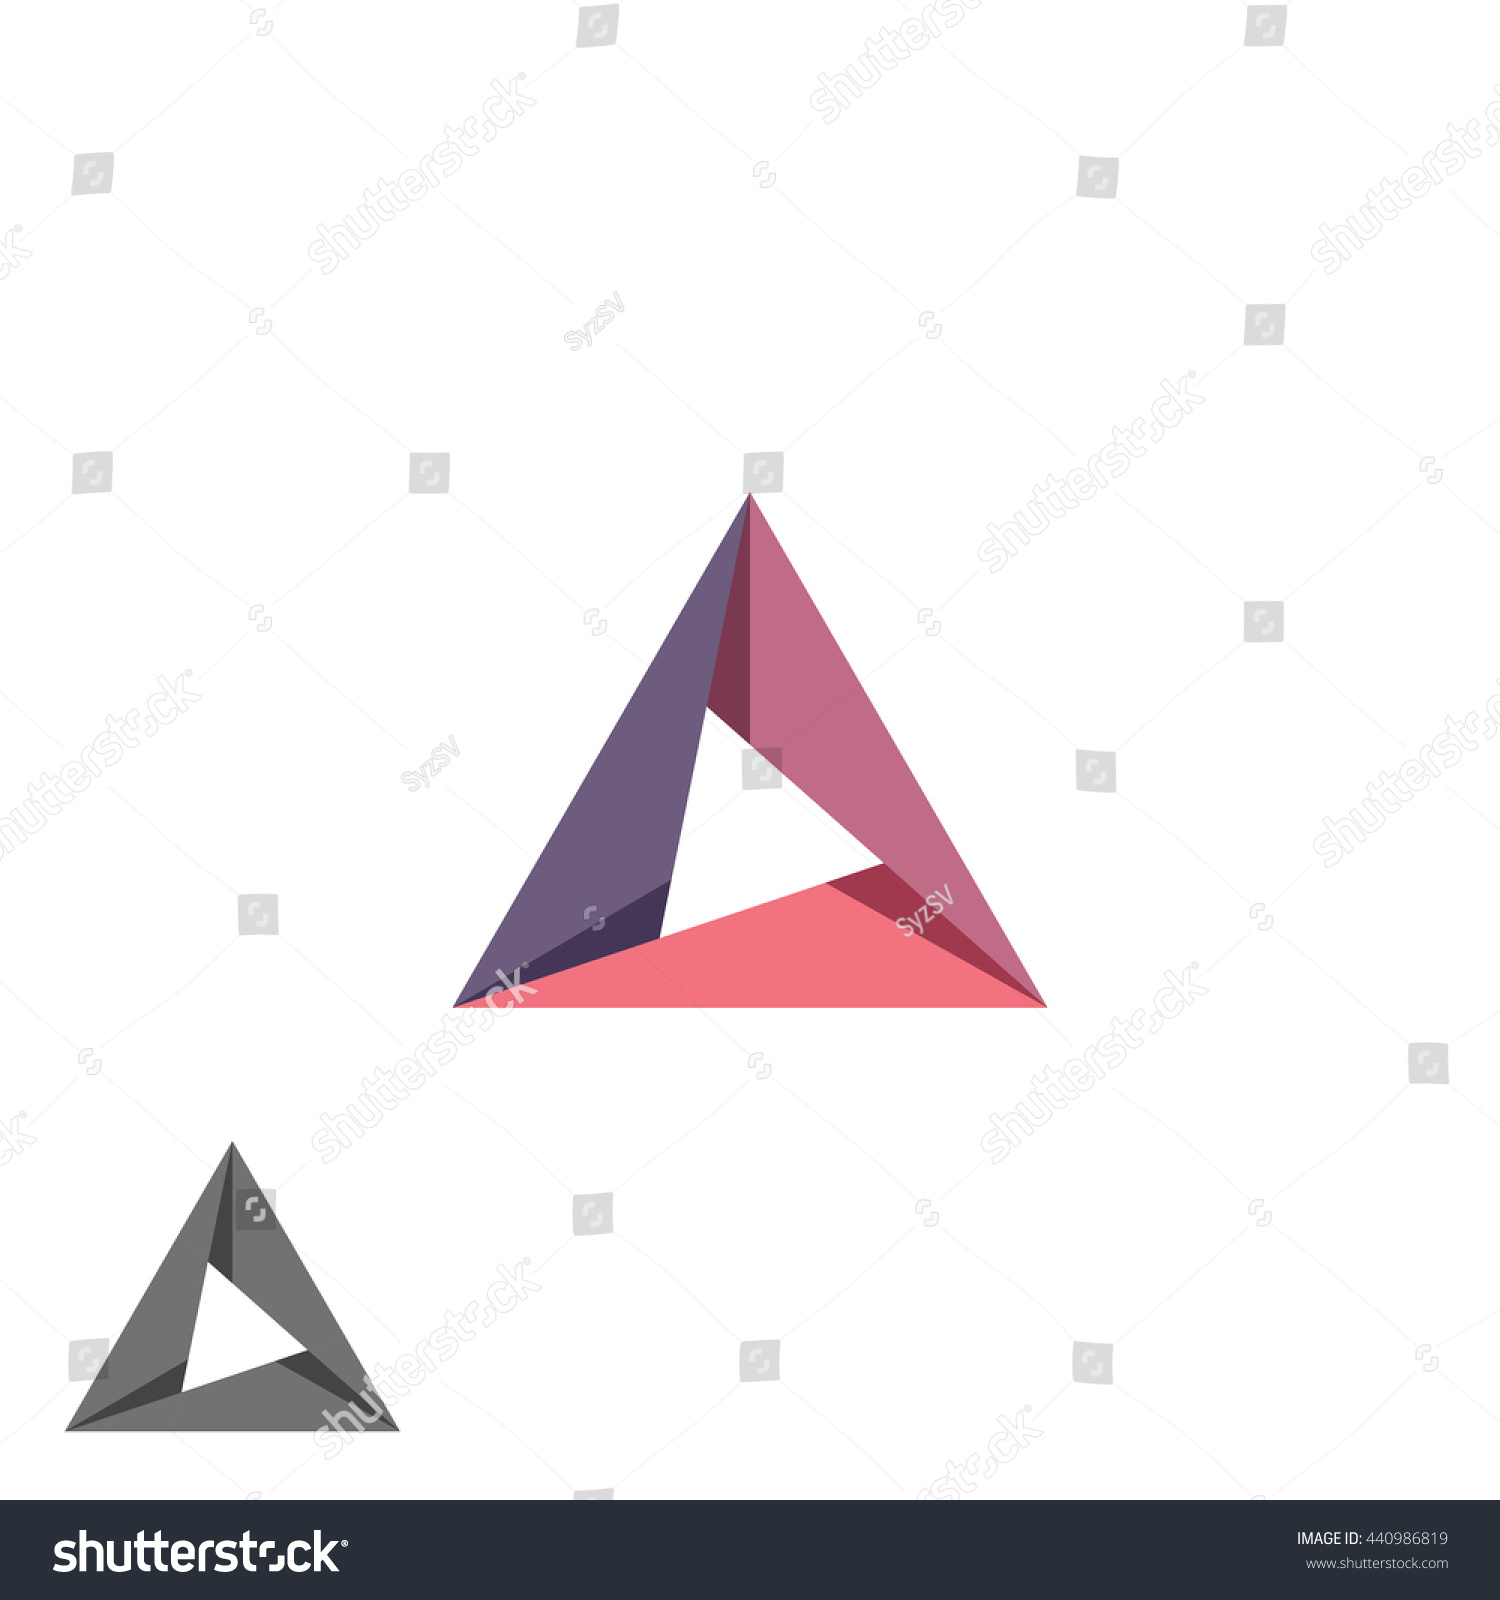 Triangle logo mockup tech shape geometric stock vector 440986819 triangle logo mockup tech shape geometric simple symbol creative converge cycle idea business card emblem magicingreecefo Choice Image